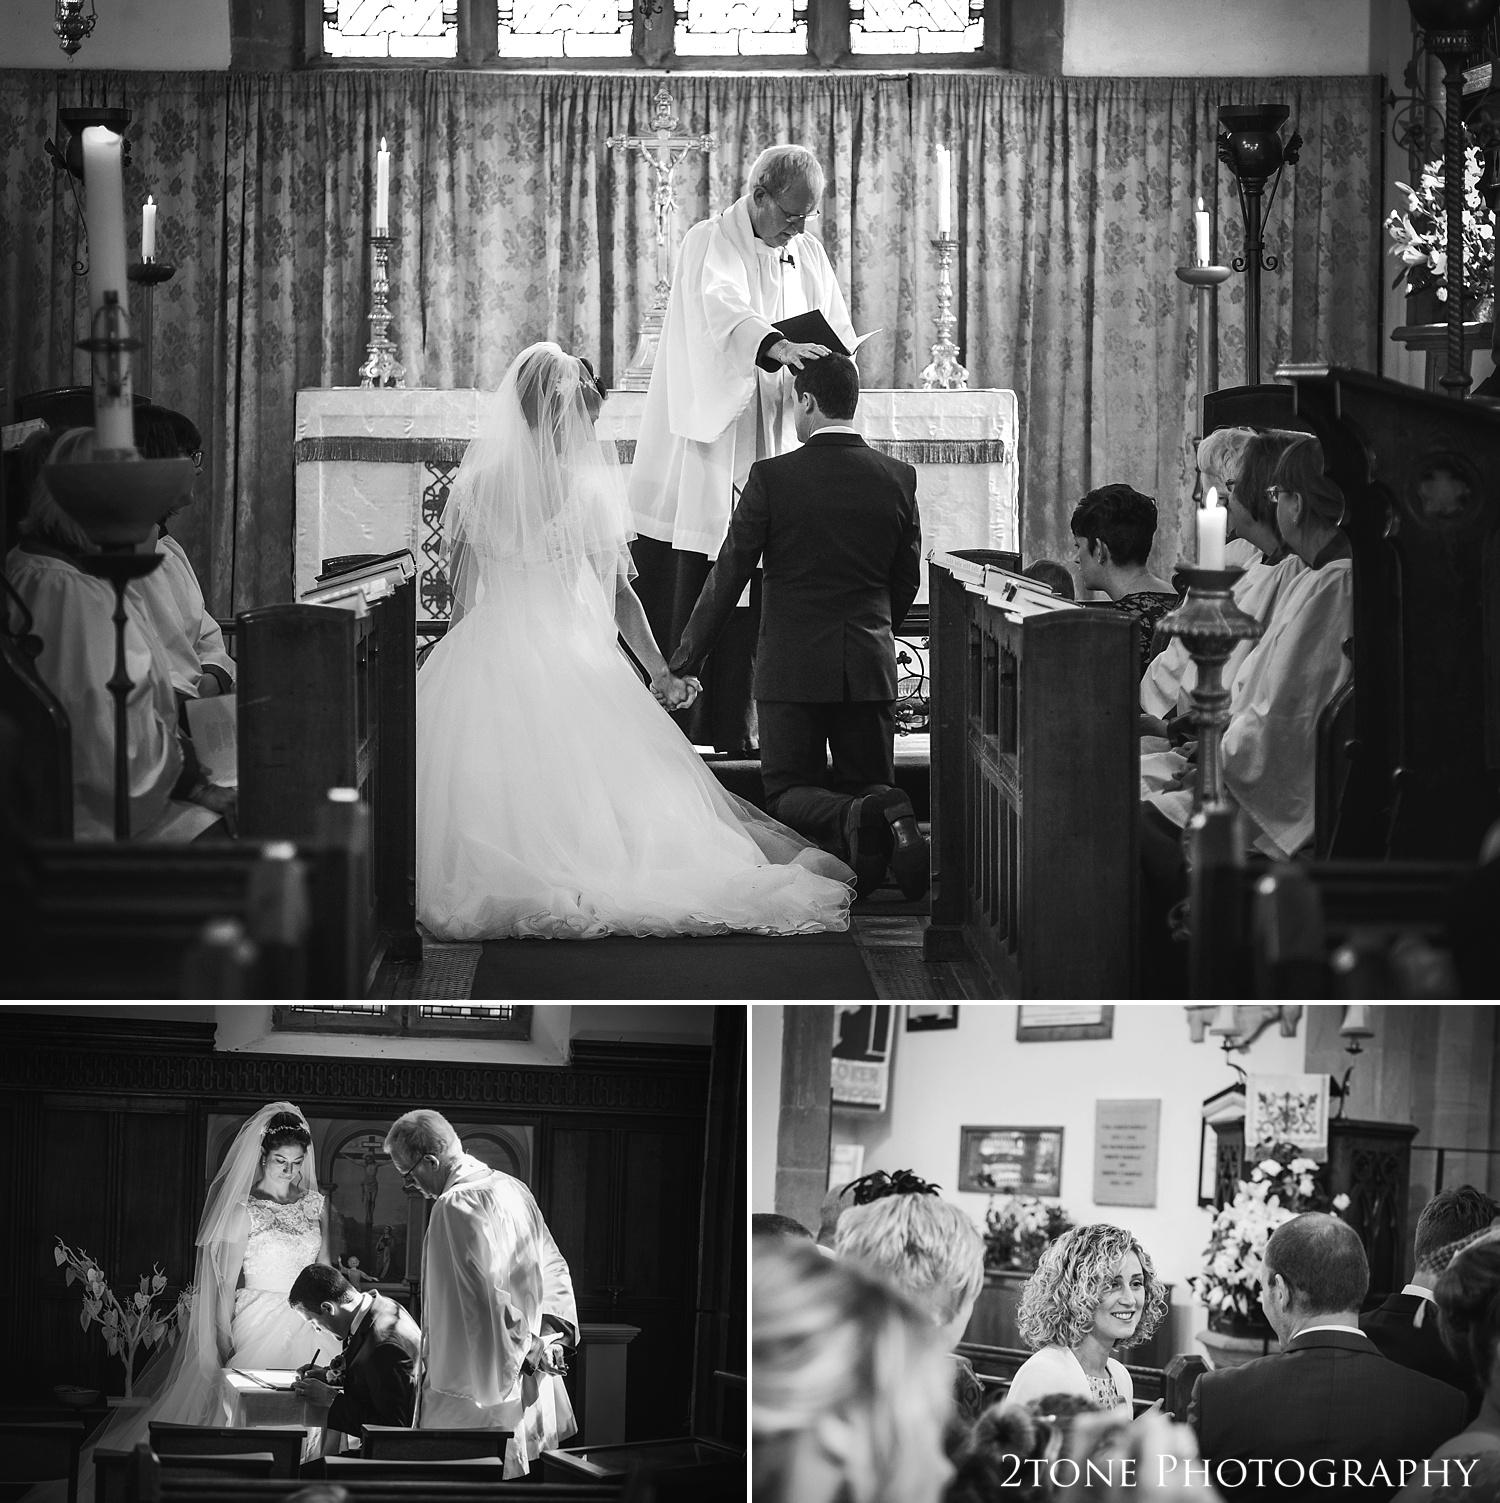 Somerset wedding photography by www.2tonephotography.co.uk